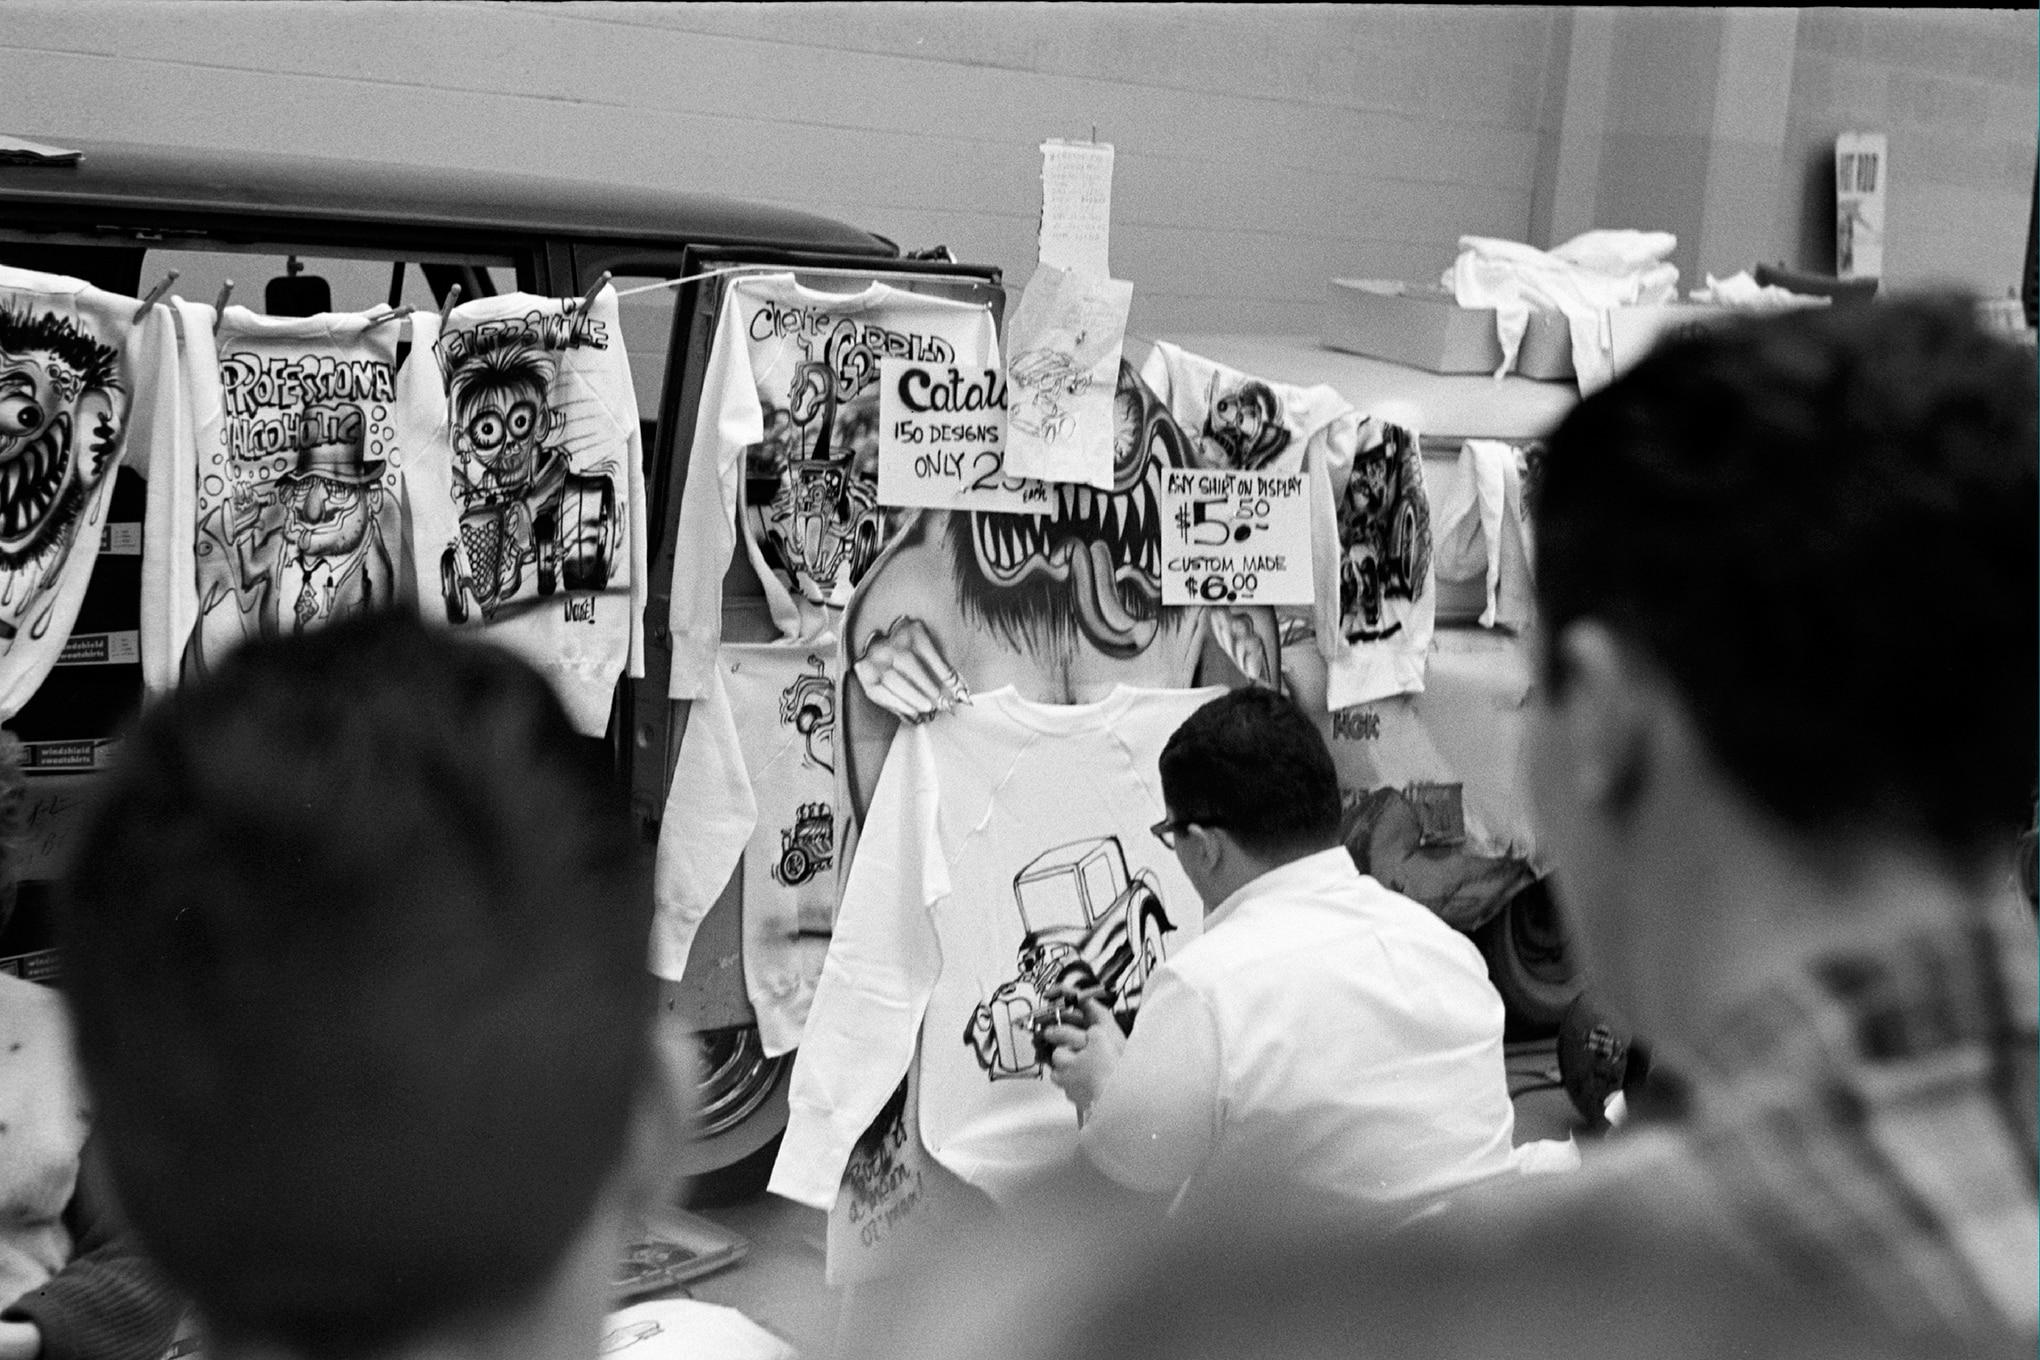 003-arch-1962-show-booth-artist-rear__16201-16_19620111_HRD-1